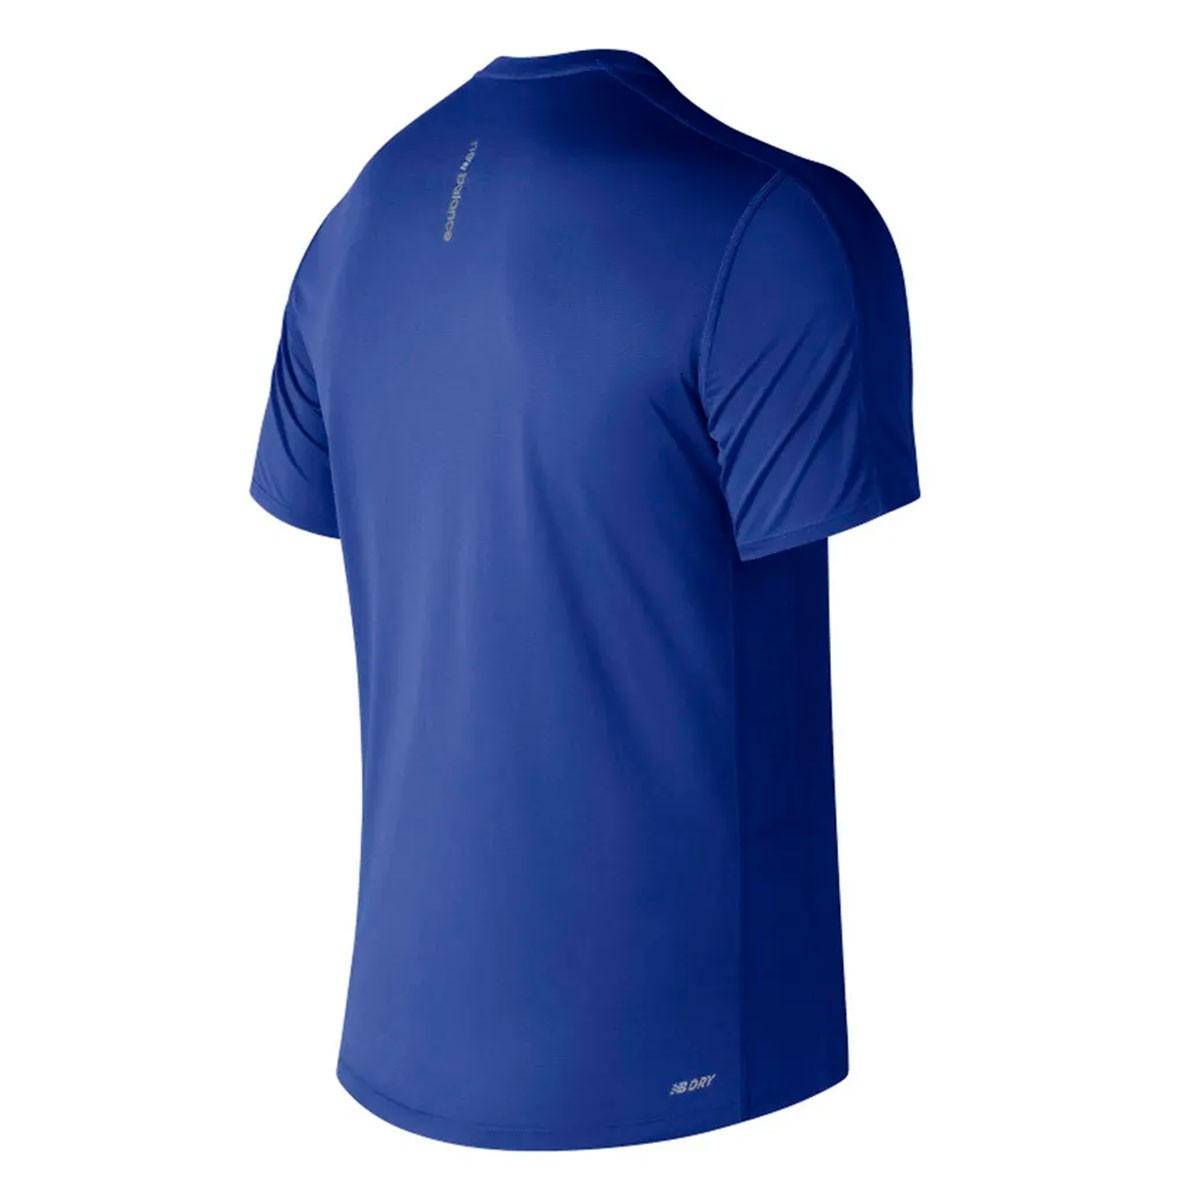 Camiseta New Balance Accelerate Masculino Azul